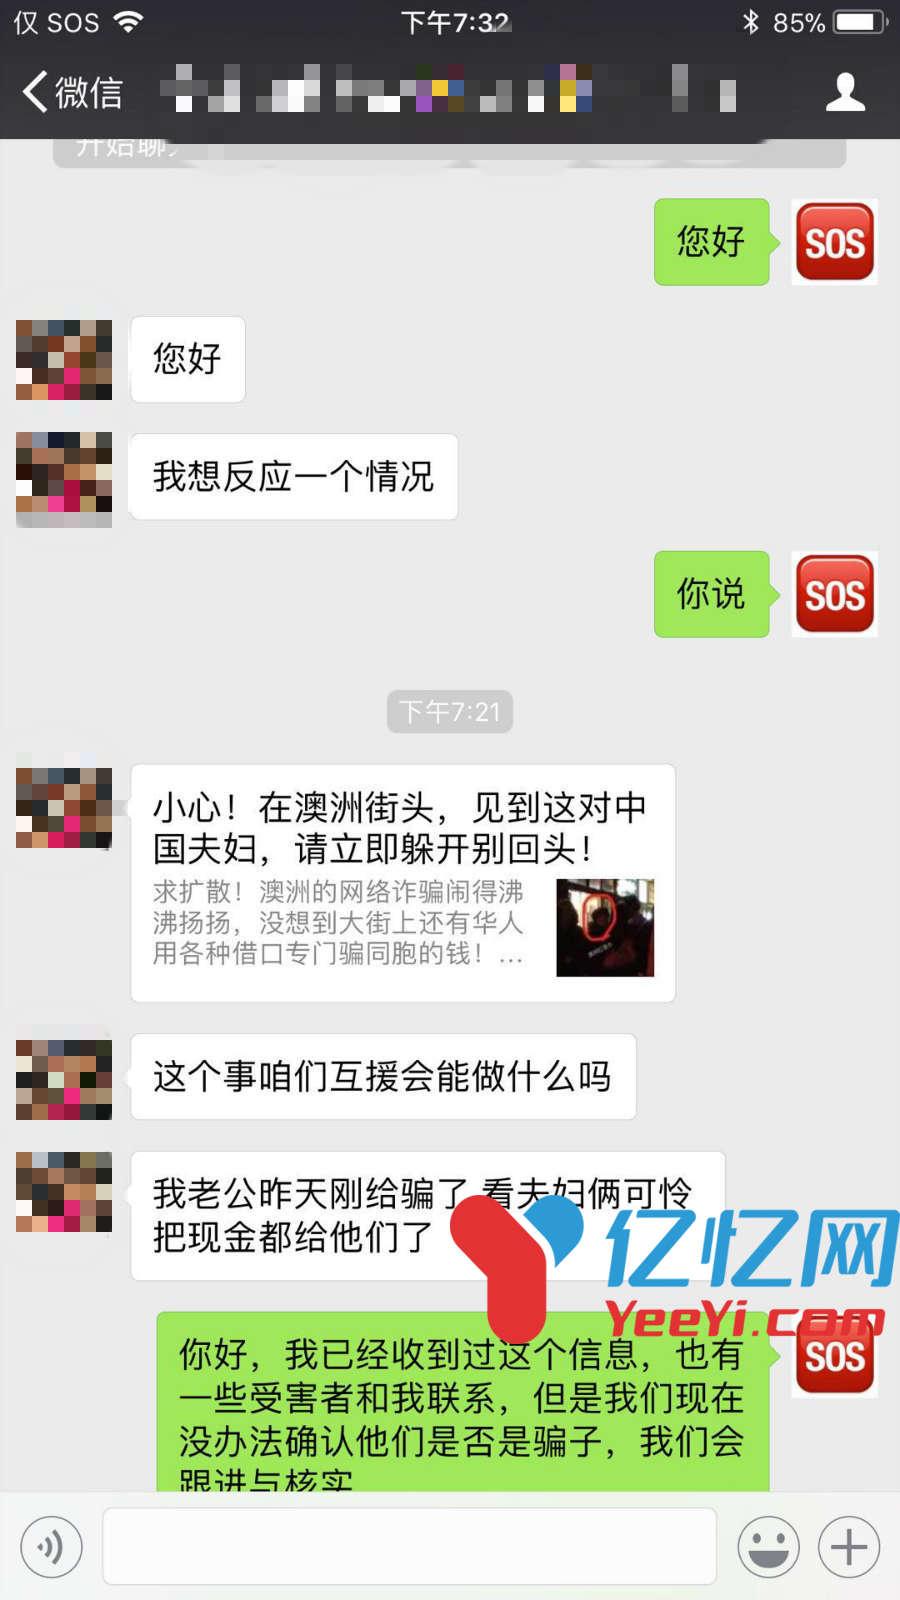 WeChat Image_20180705081729_meitu_5.jpg?x-oss-process=image/format,png